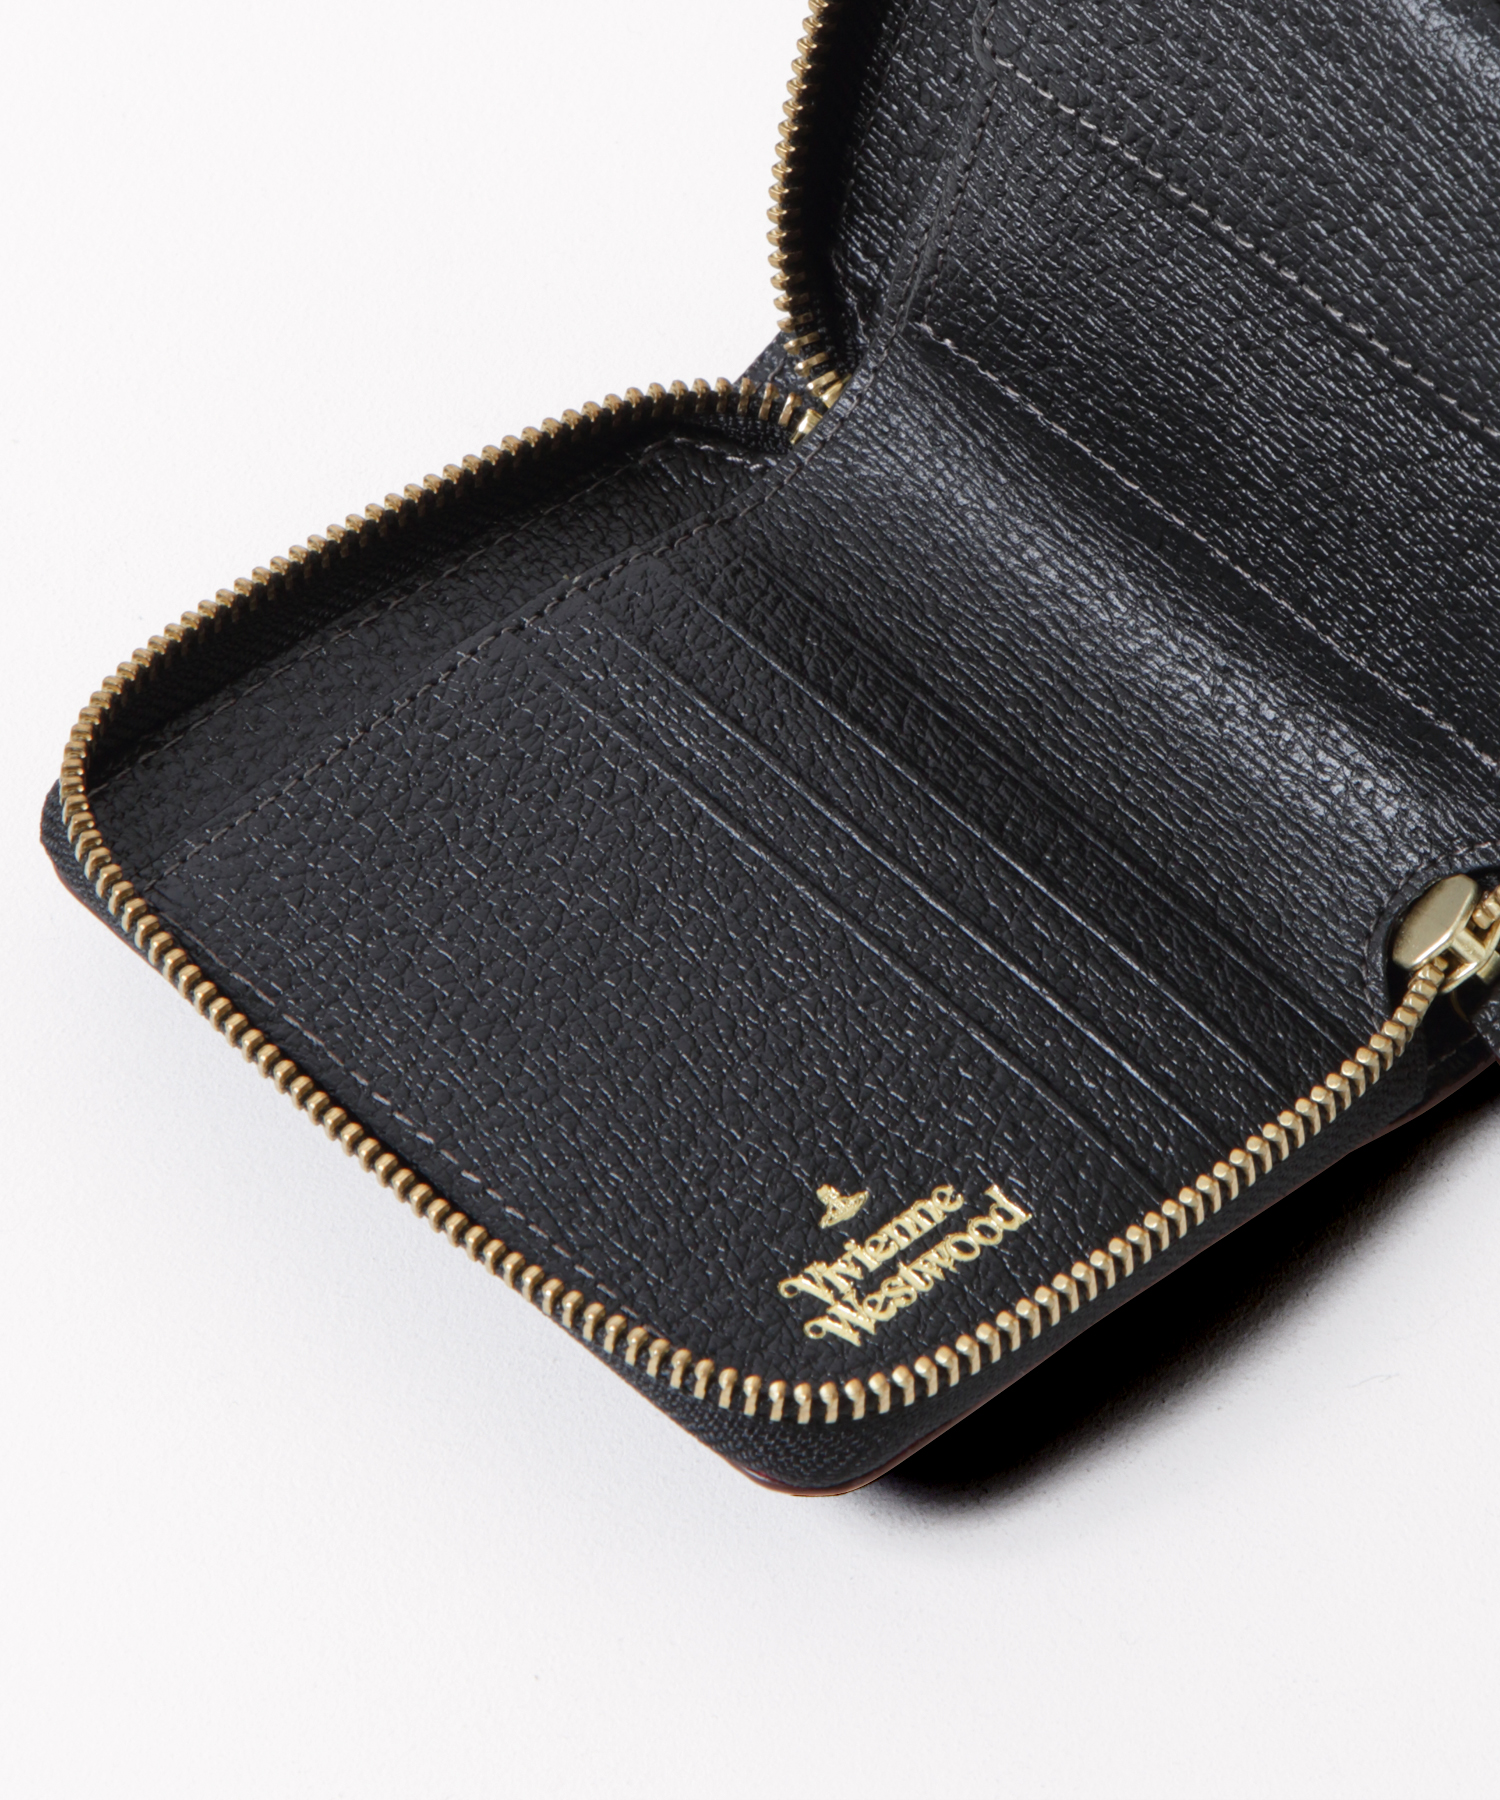 EXECUTIVE ラウンドファスナー二つ折り財布